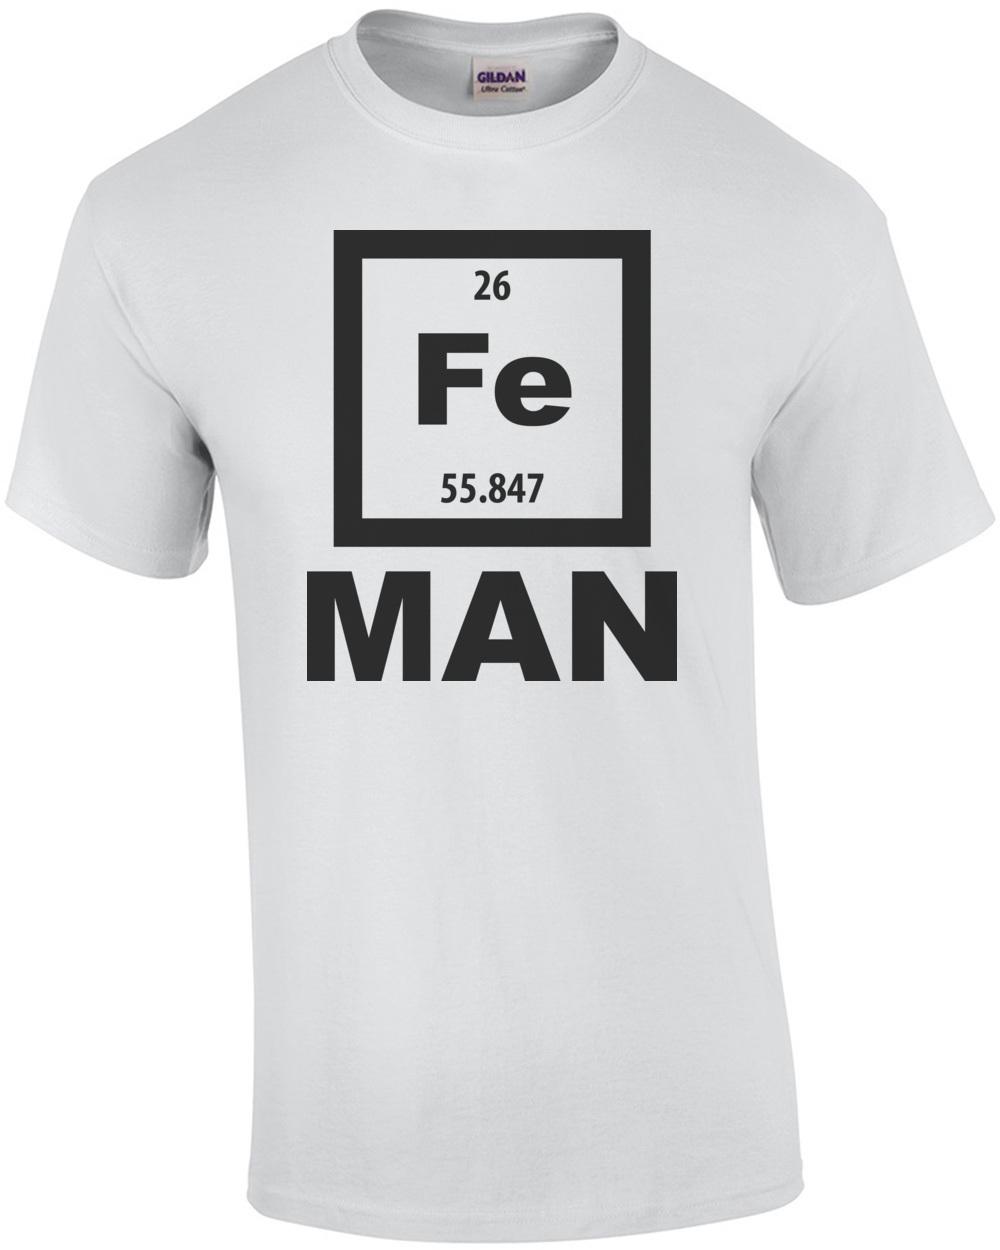 Fe man iron man element periodic table t shirt urtaz Images